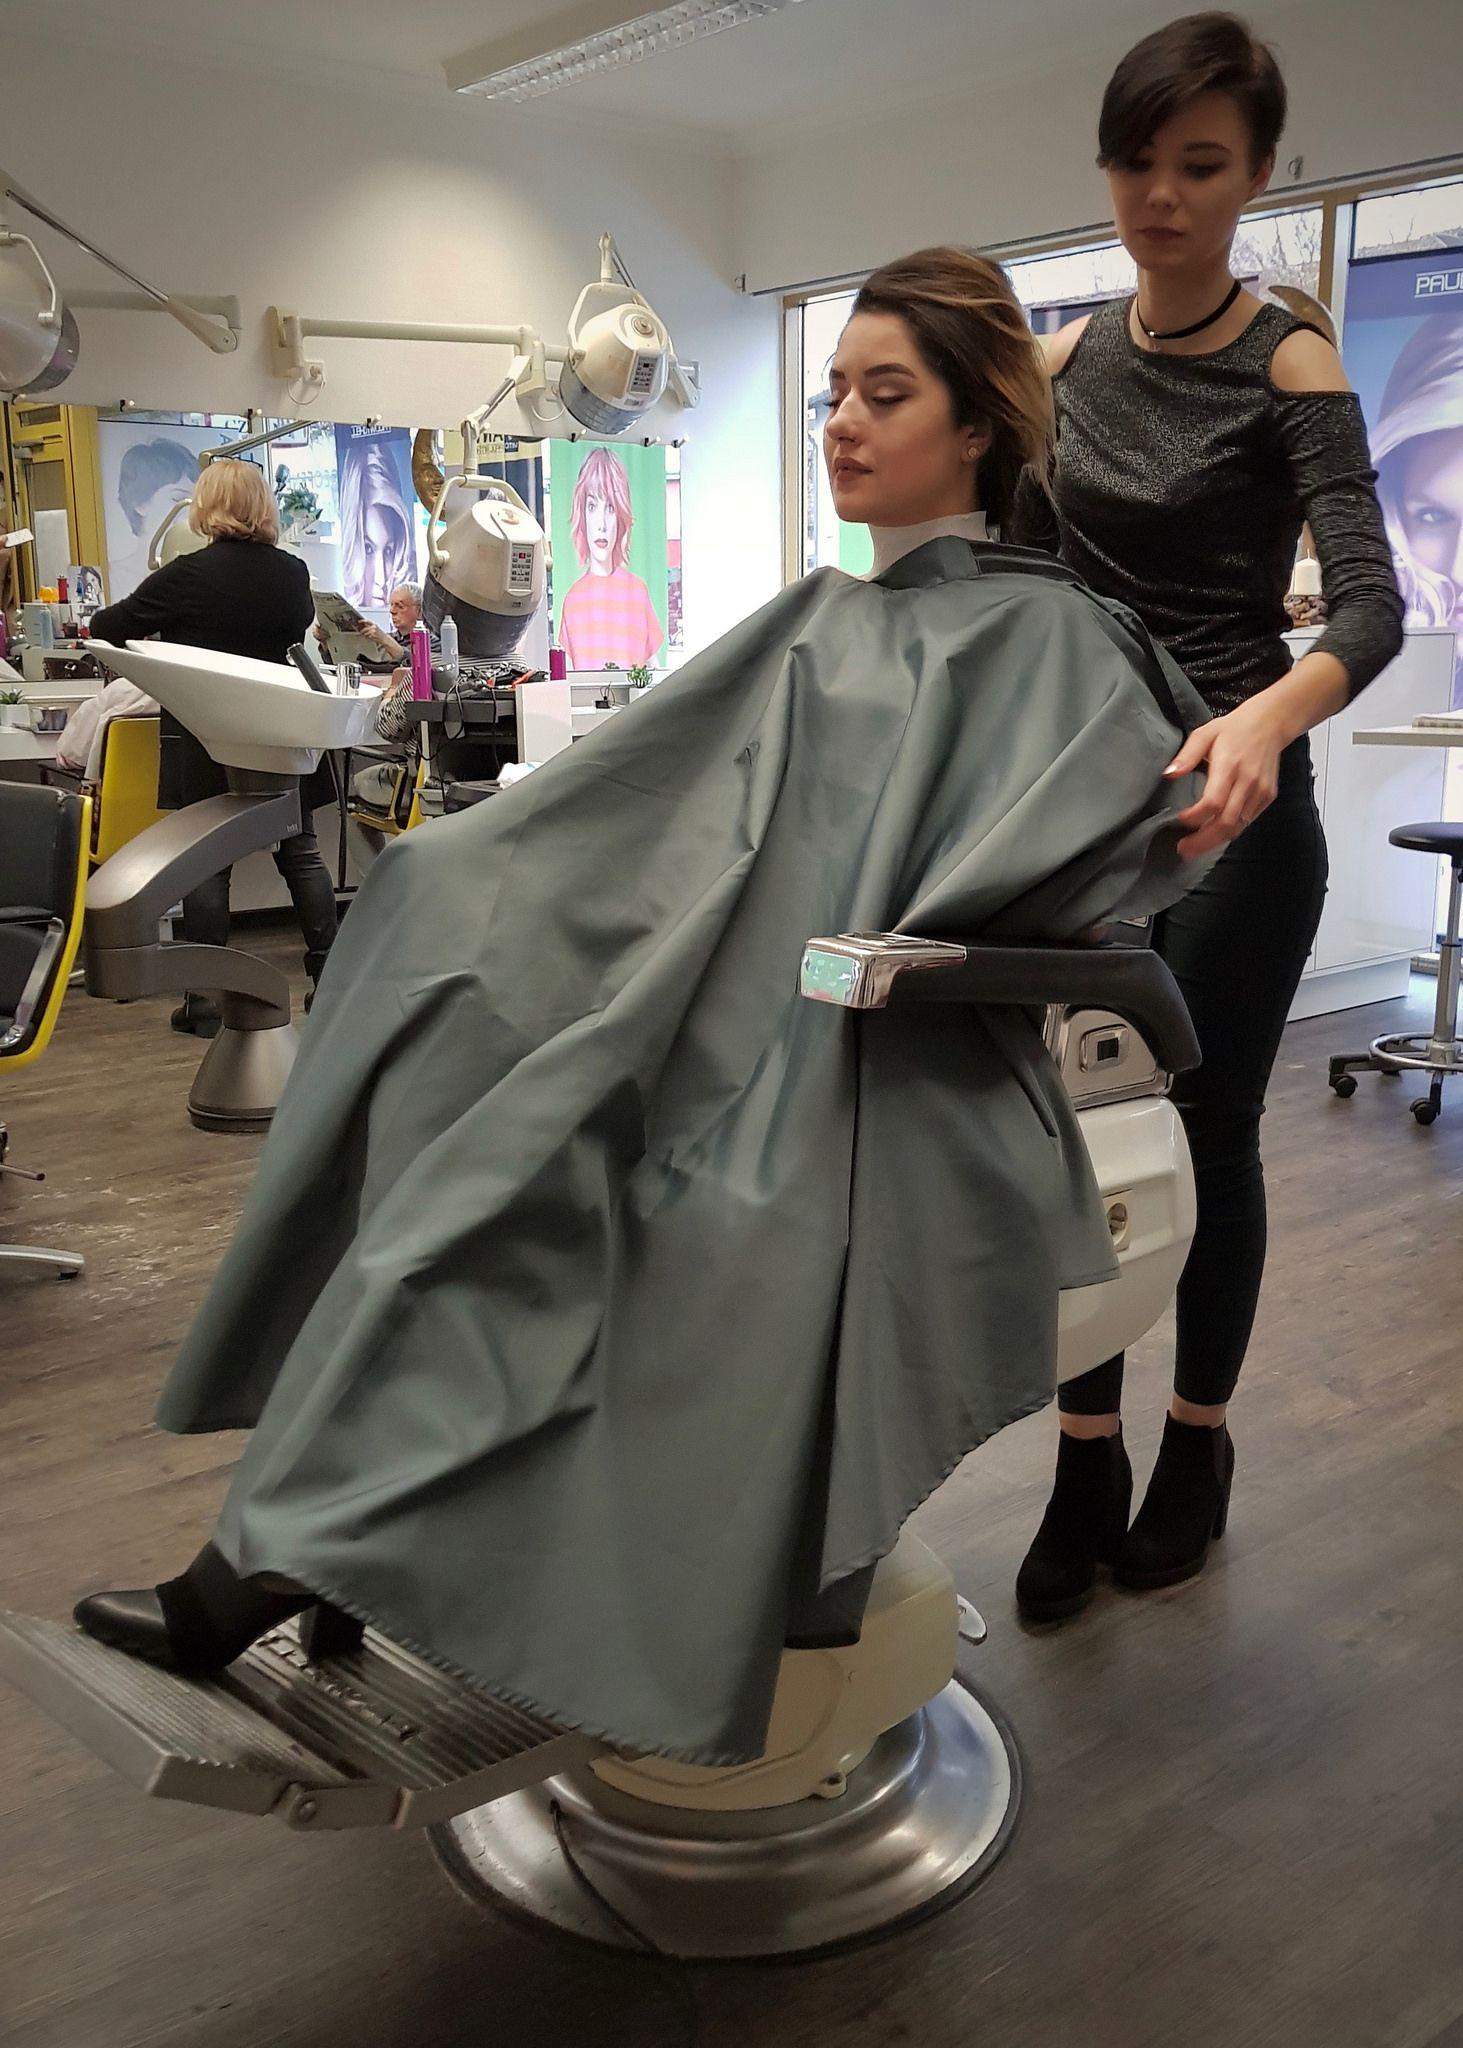 Untitled Trendy Short Hair Styles Salon Hair Dryer Female Barber